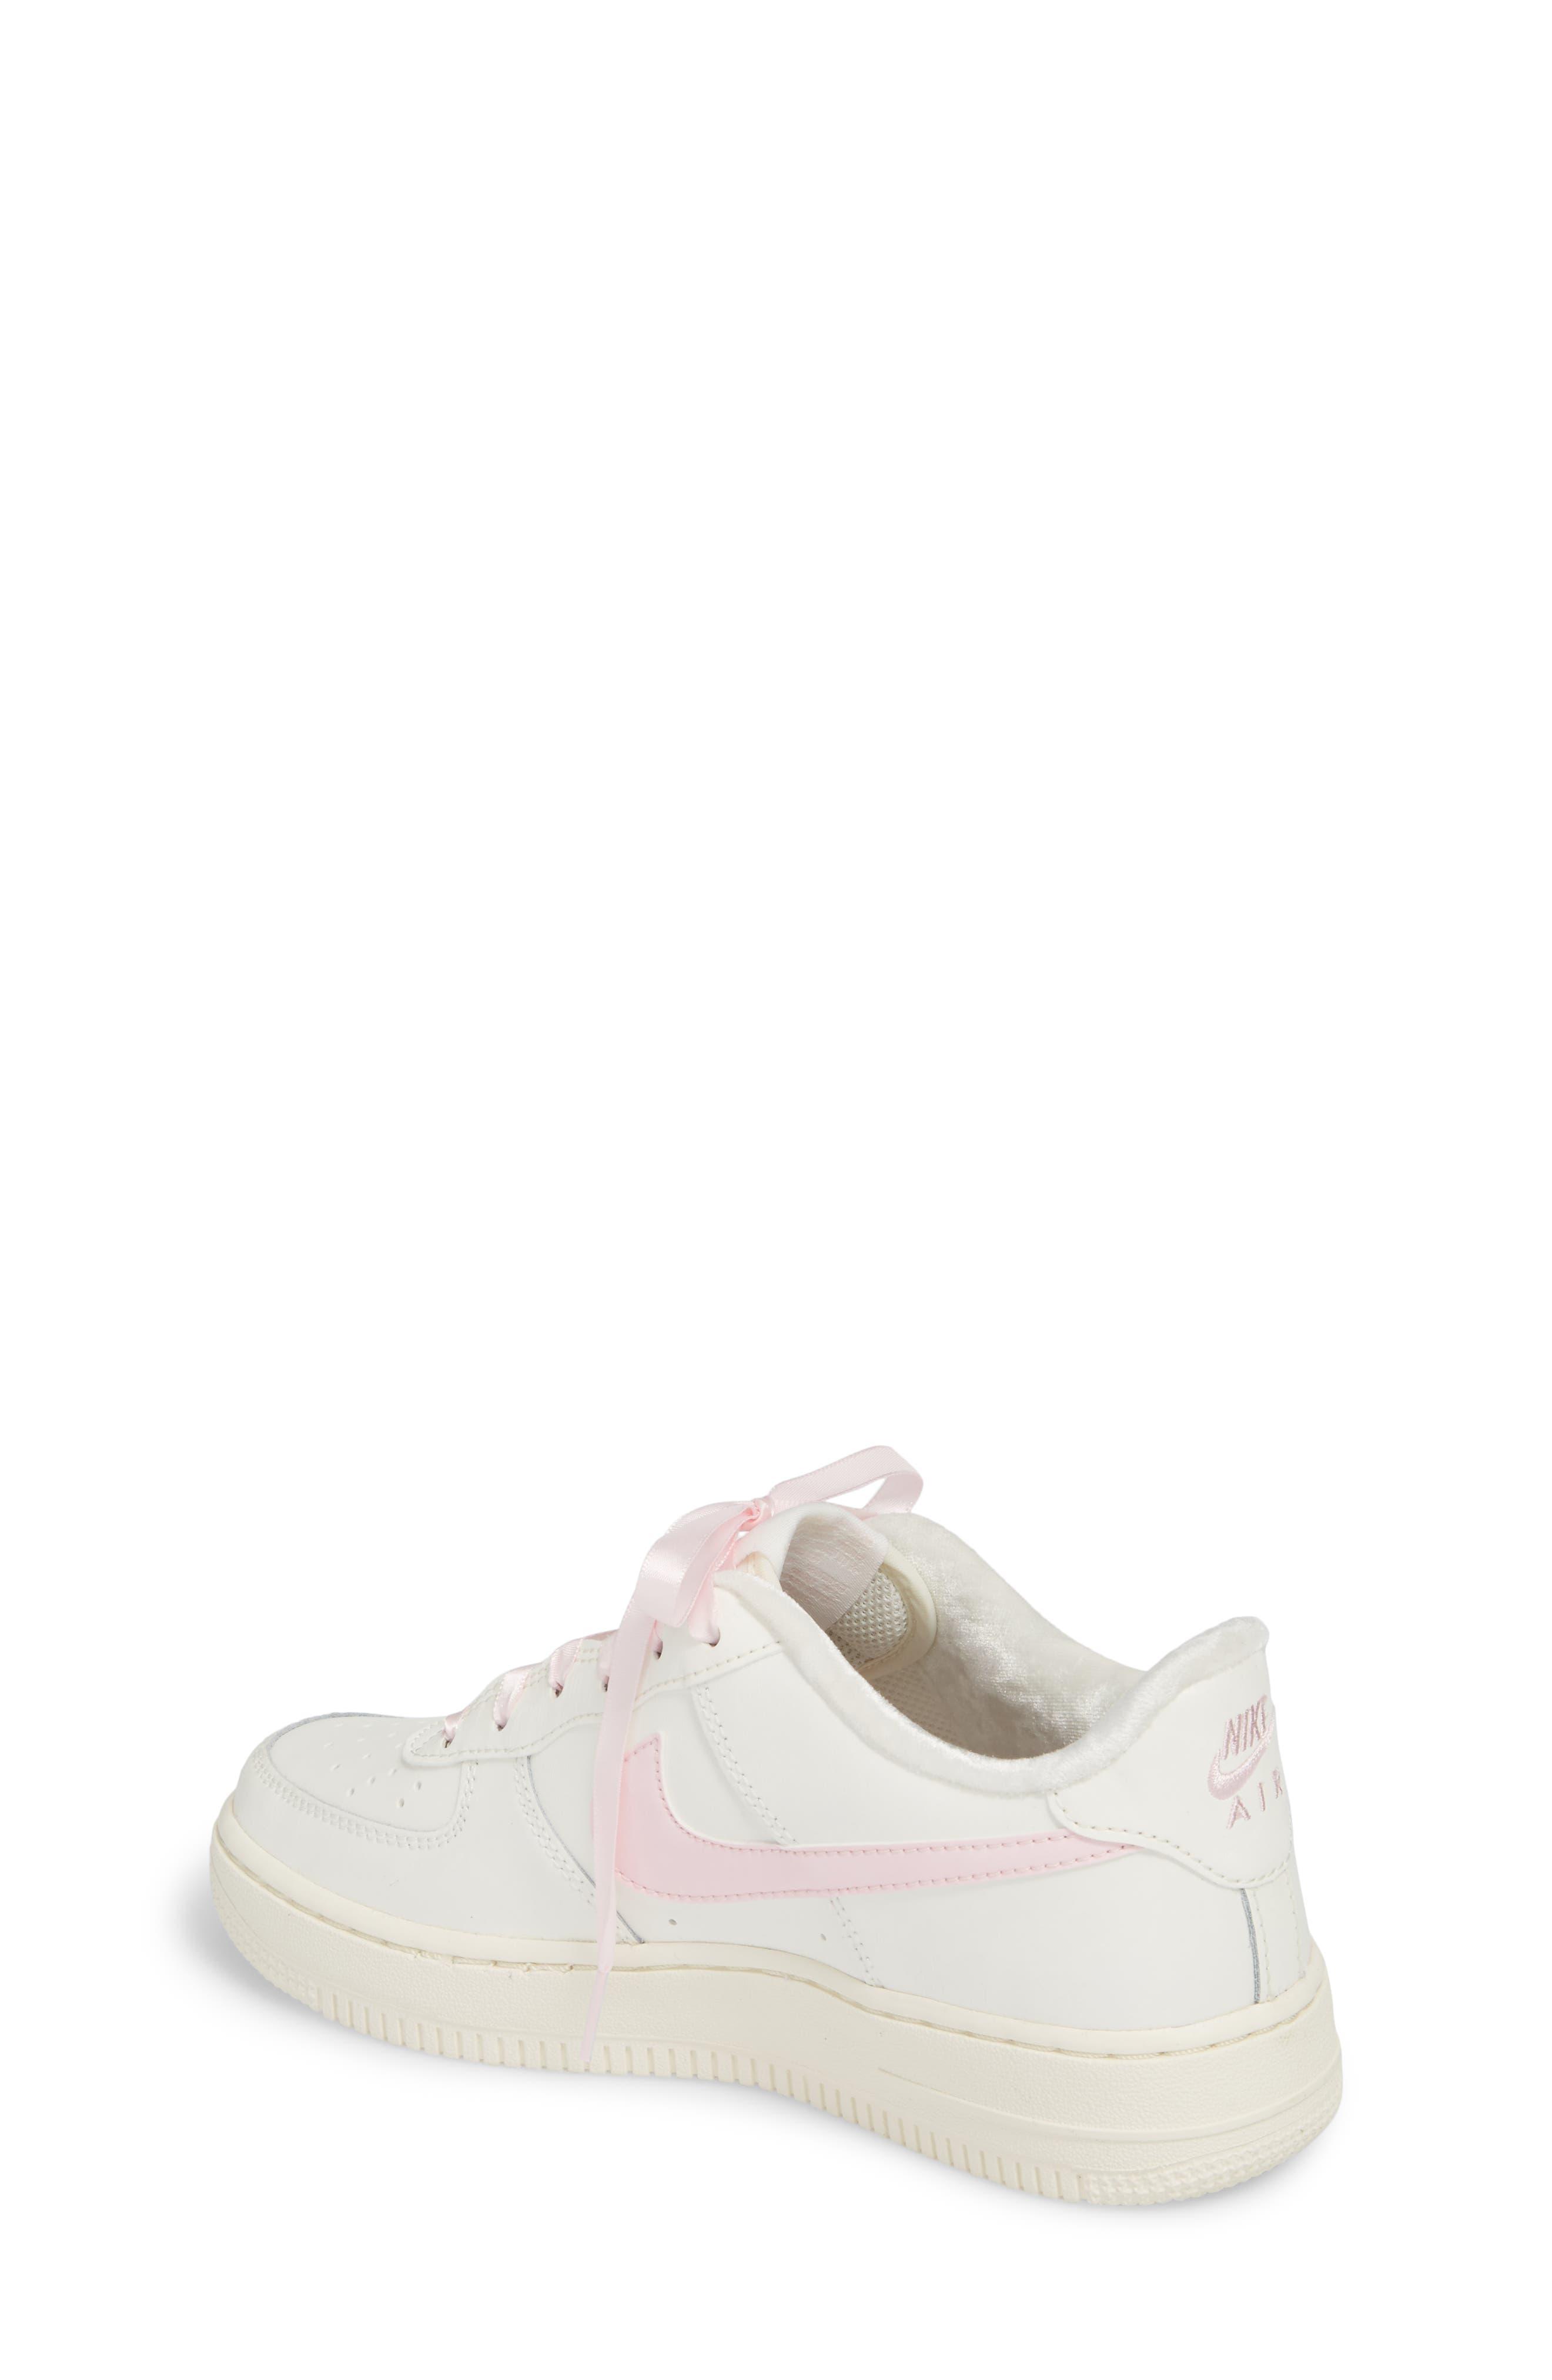 Air Force 1 '06 Sneaker,                             Alternate thumbnail 5, color,